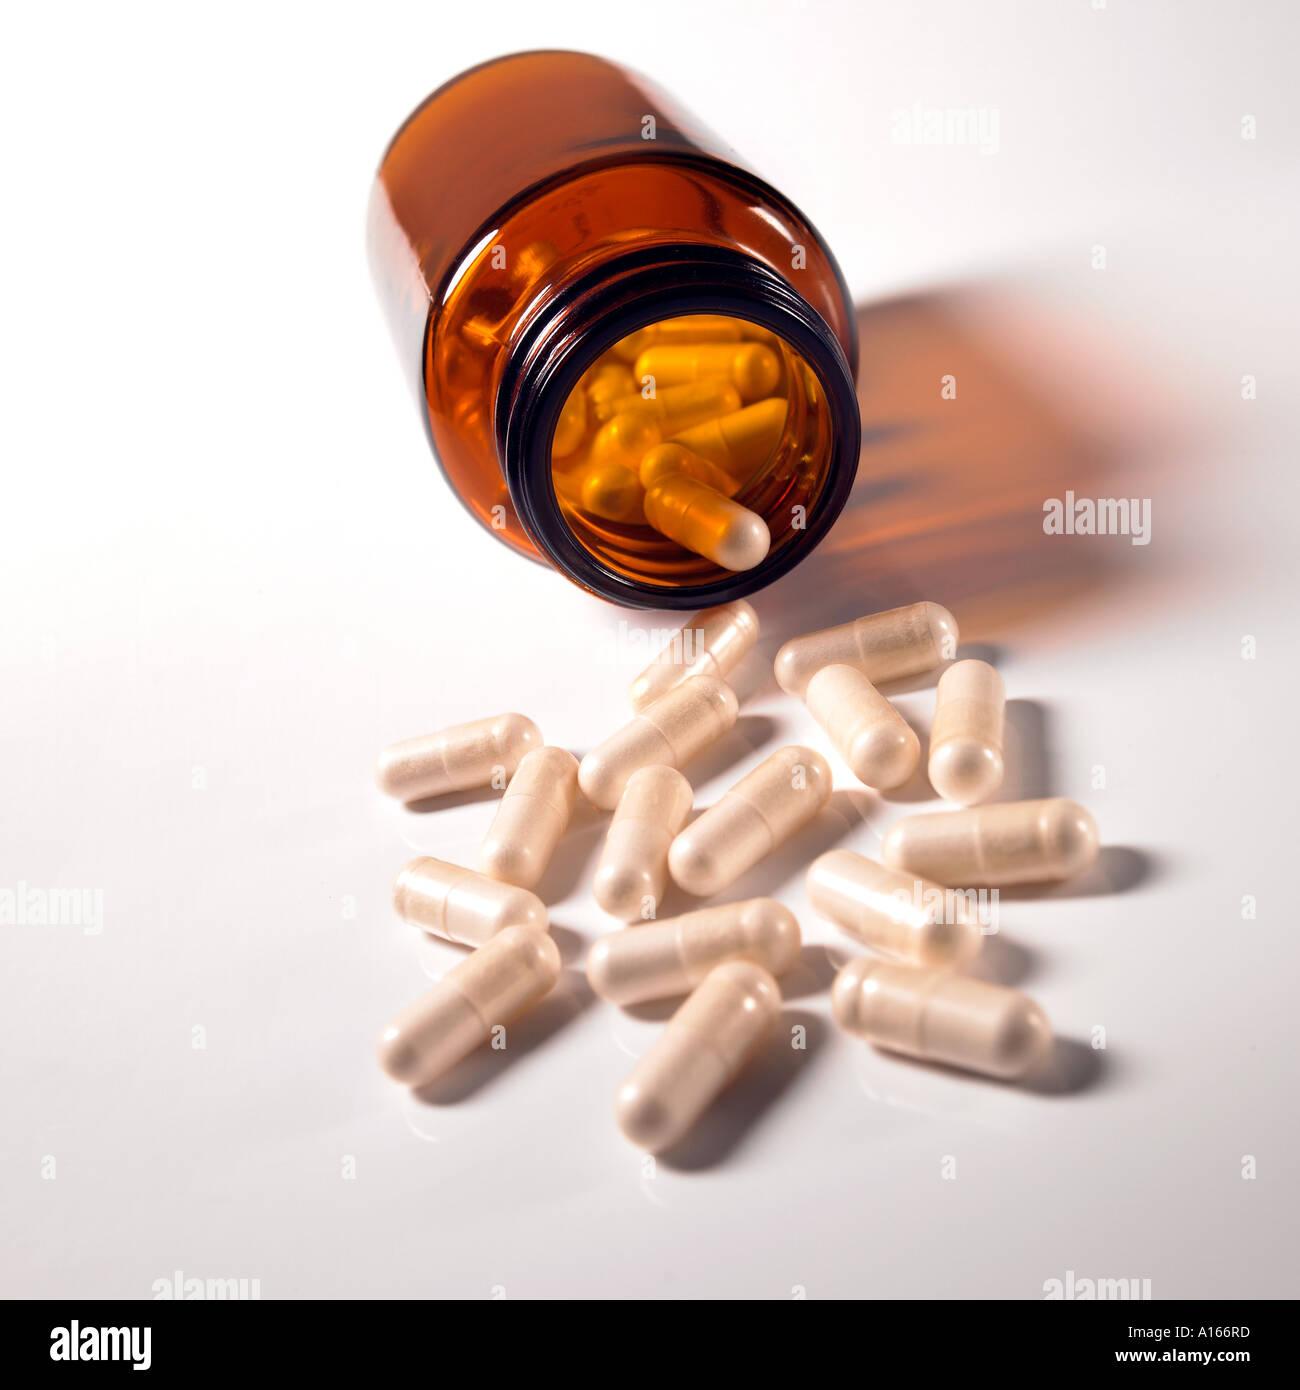 Píldoras se haya derramado. Foto de stock